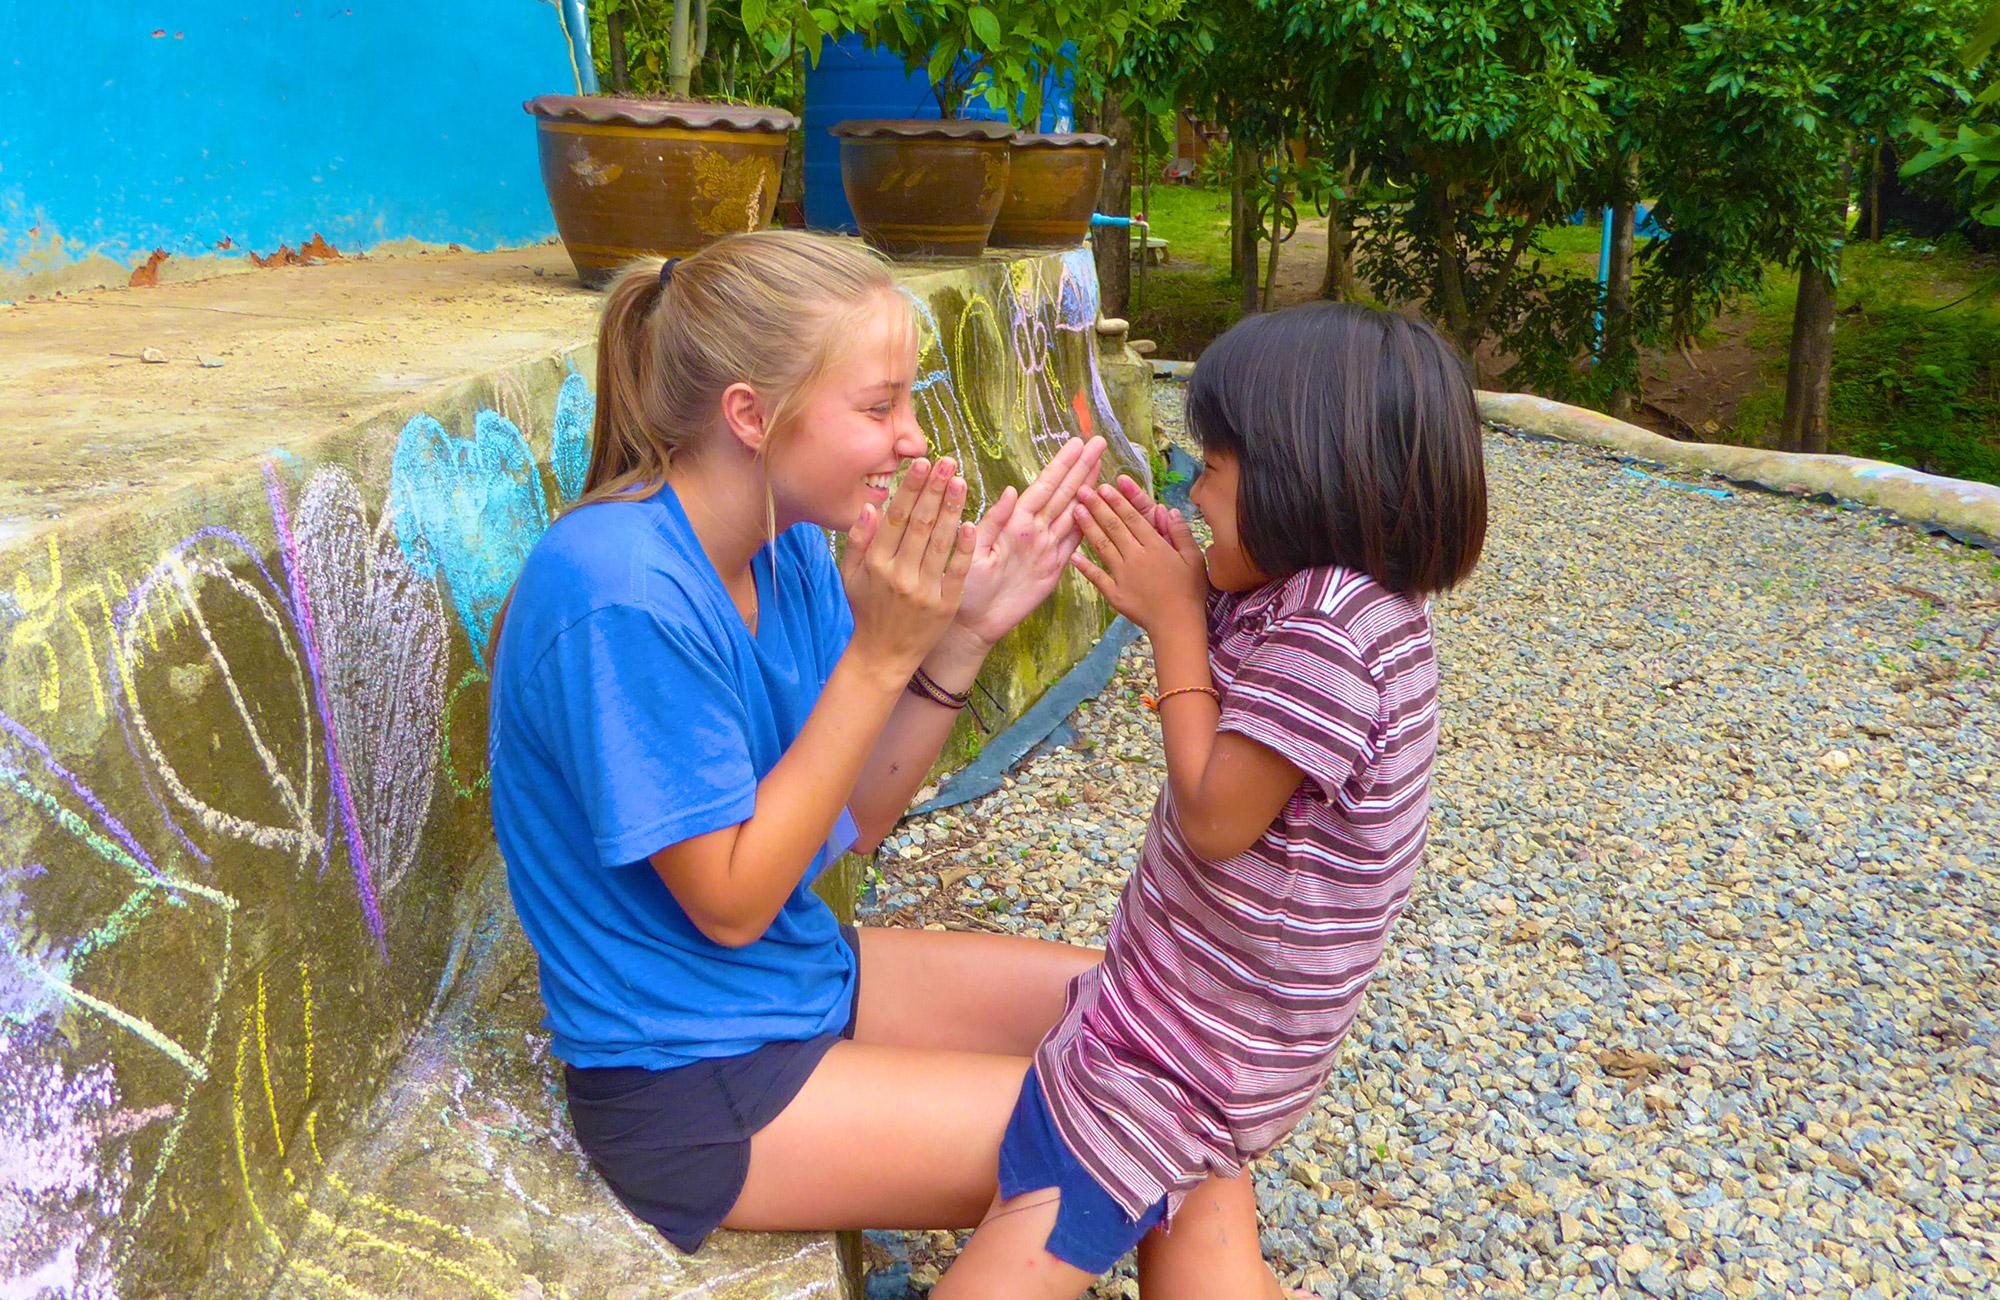 service in thai highlands moondance